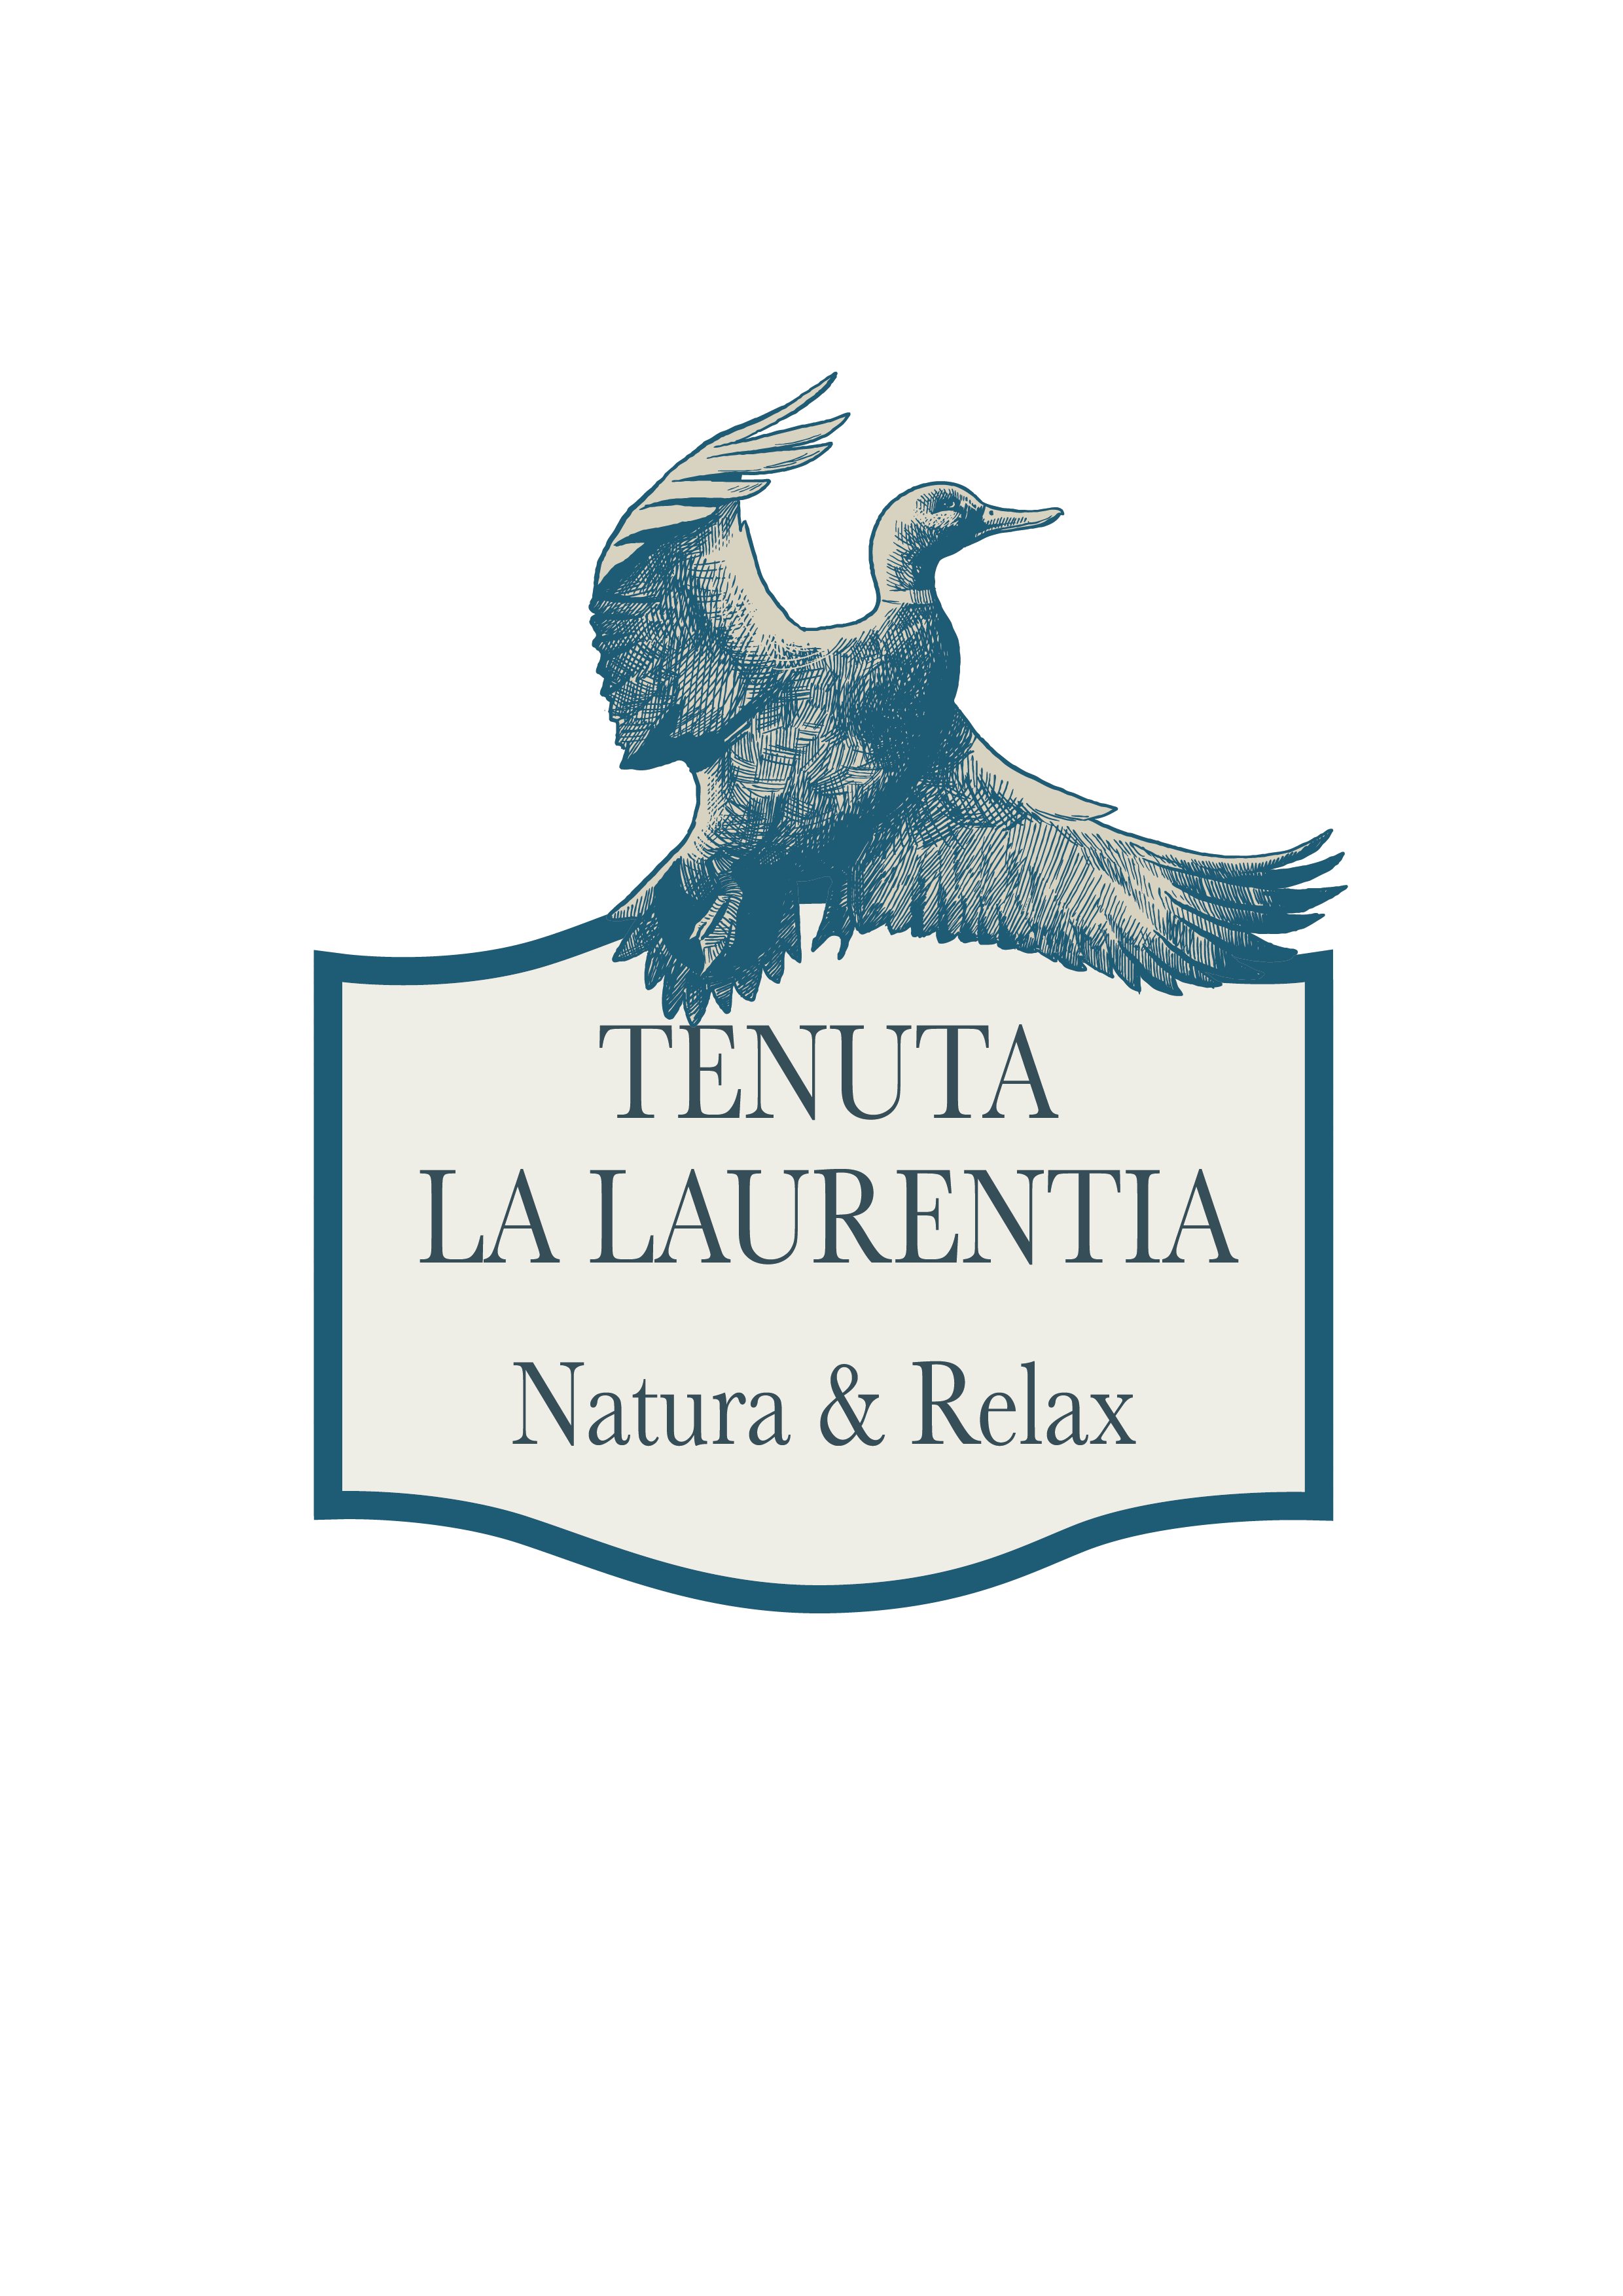 logo sito-01